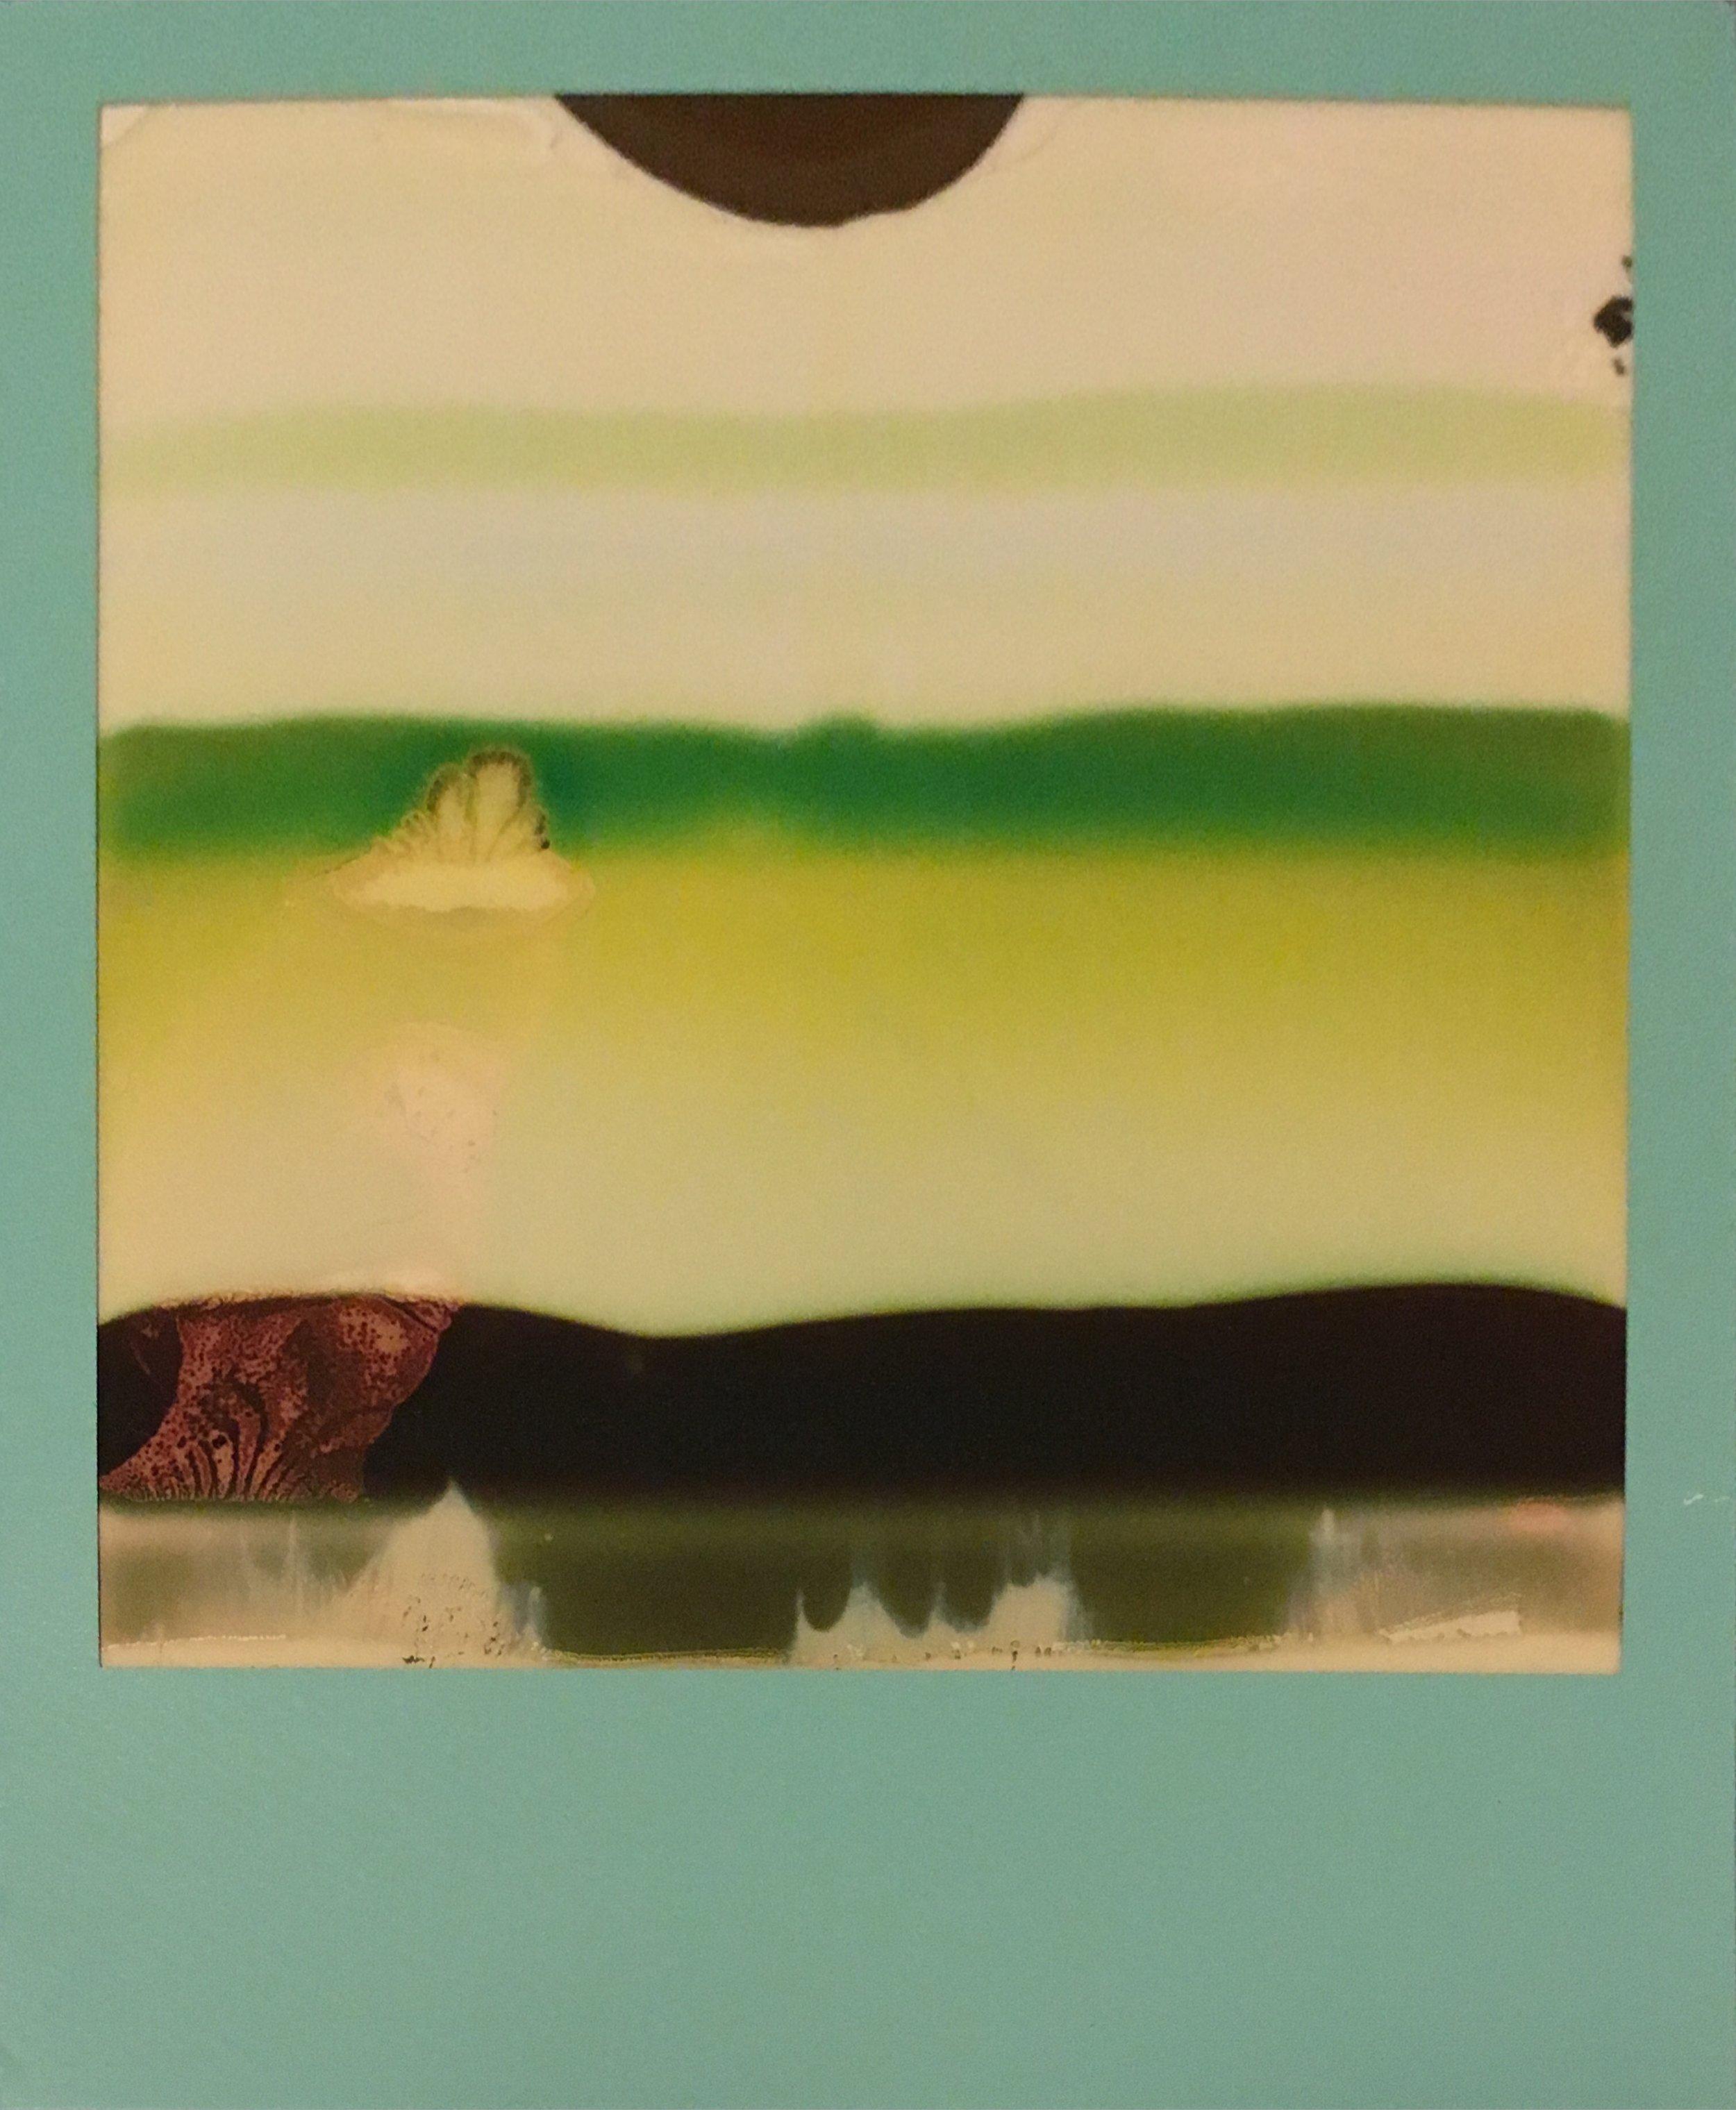 """Untitled"" by Hannah Novak"